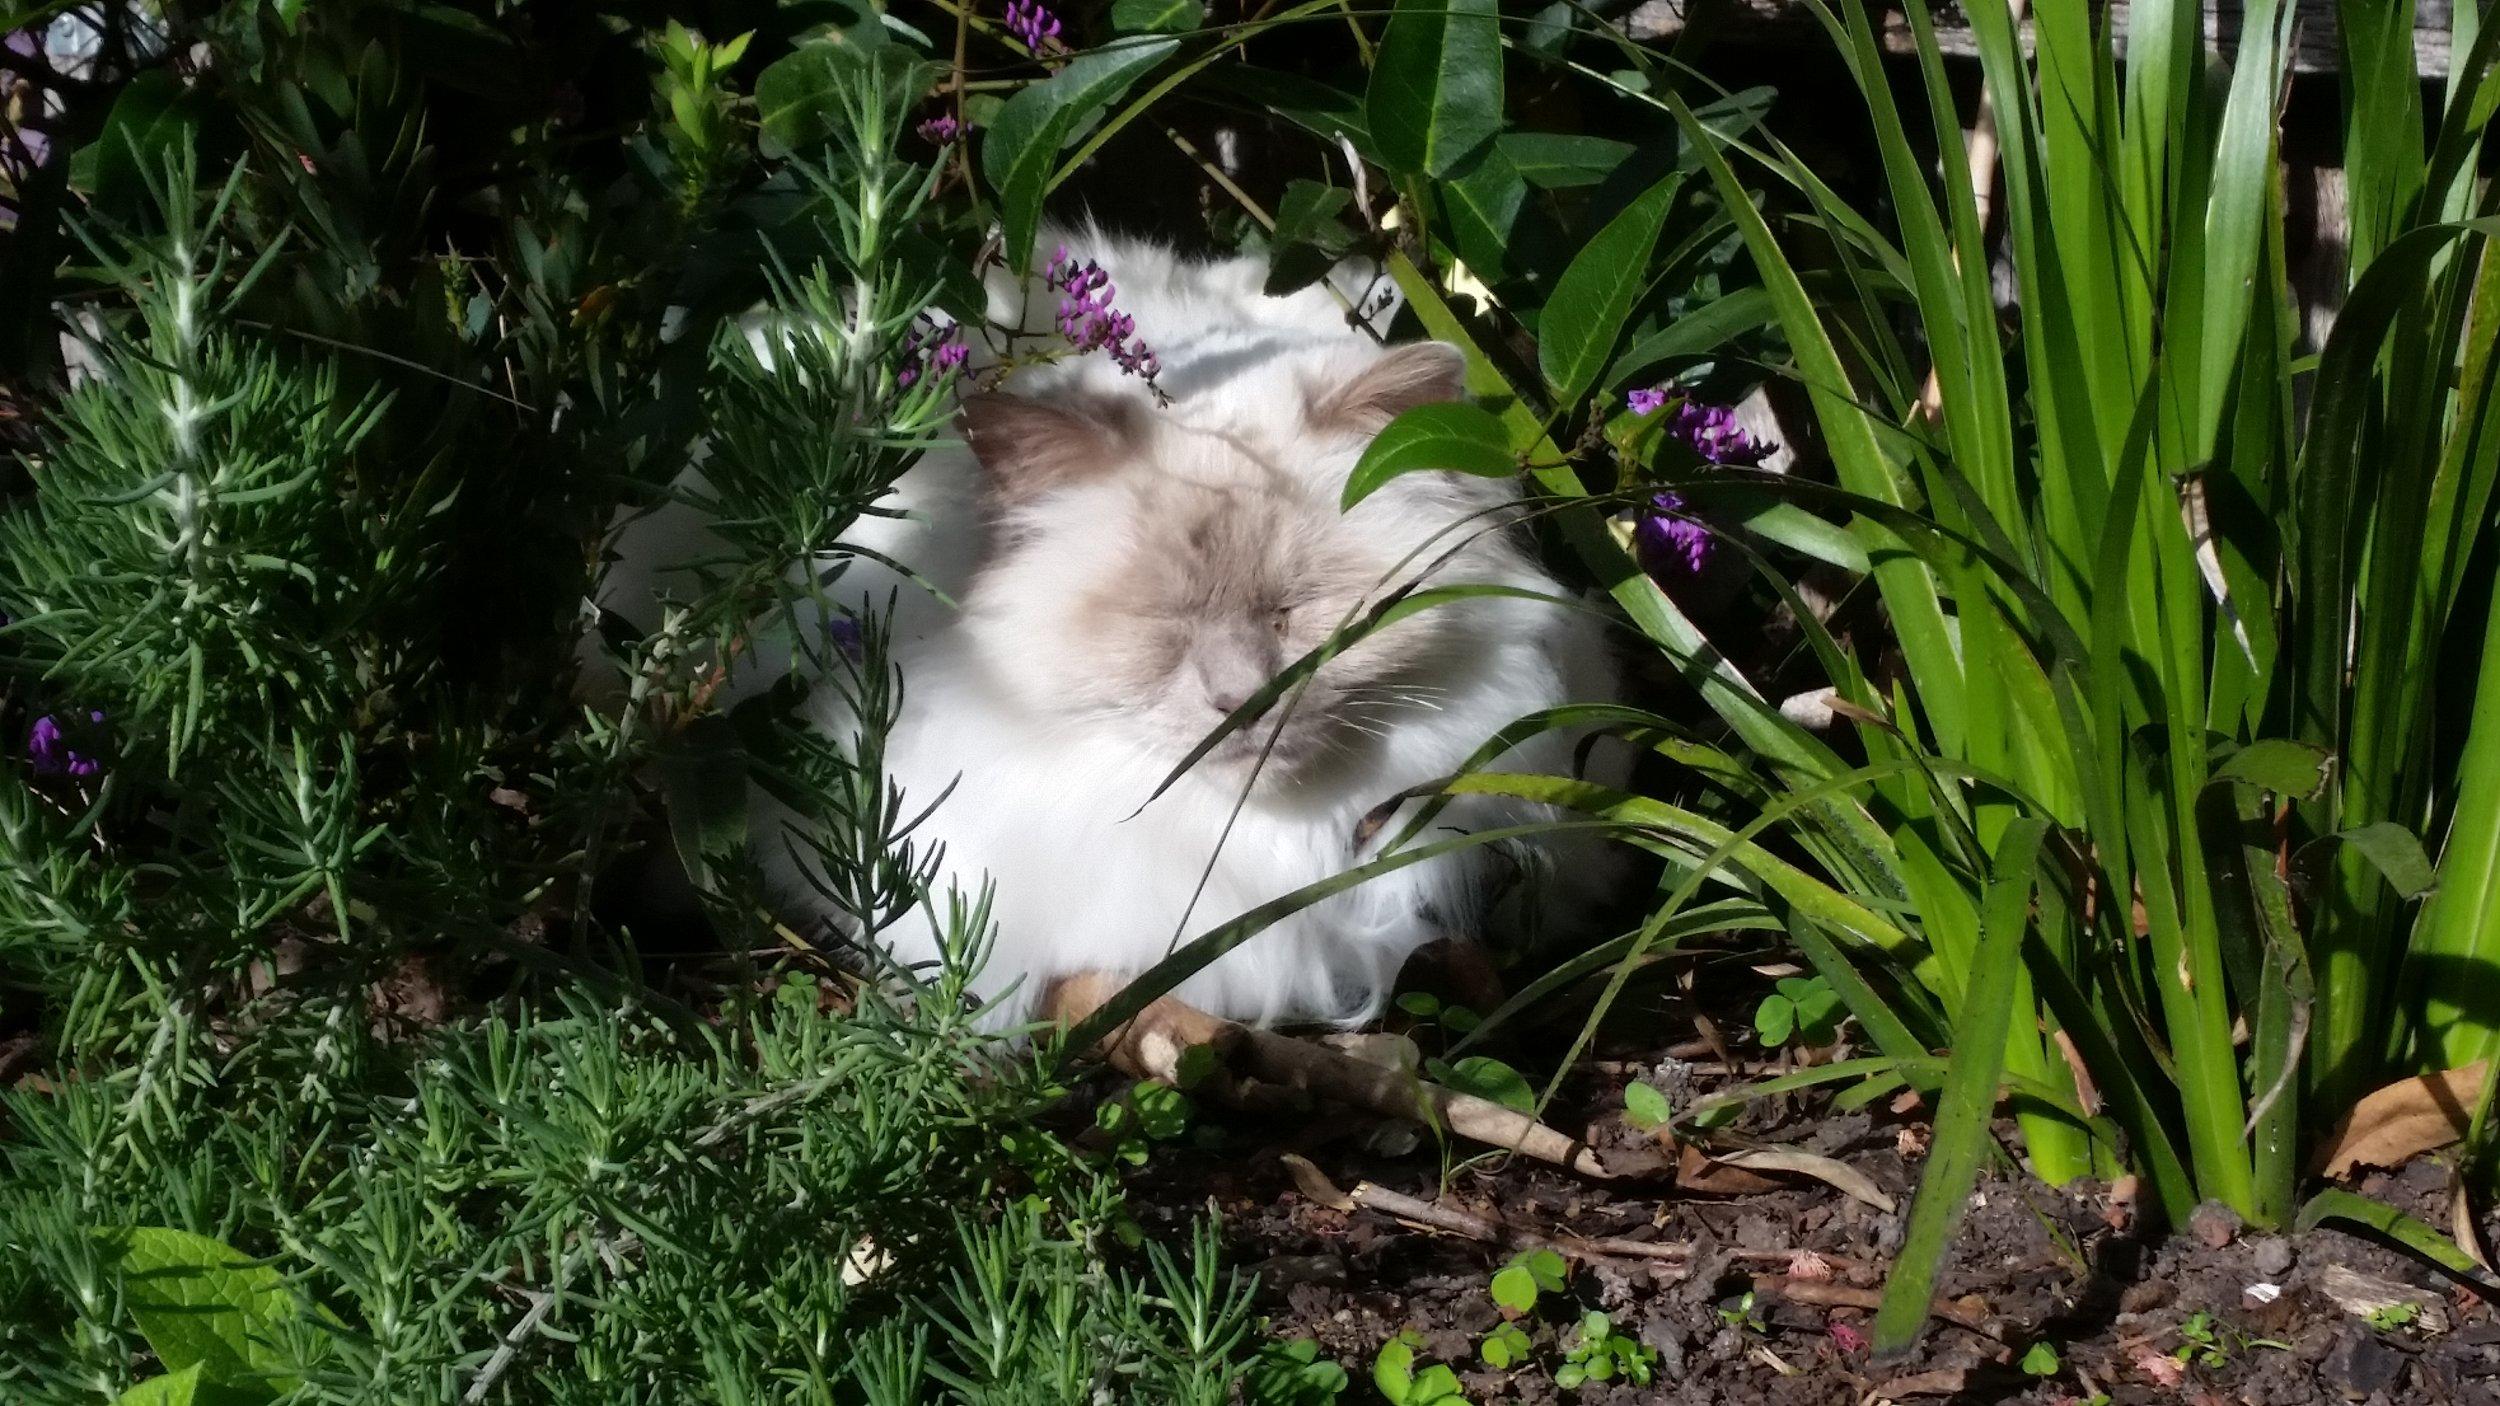 Zeus the cat enjoying the therapeutic benefits of plants